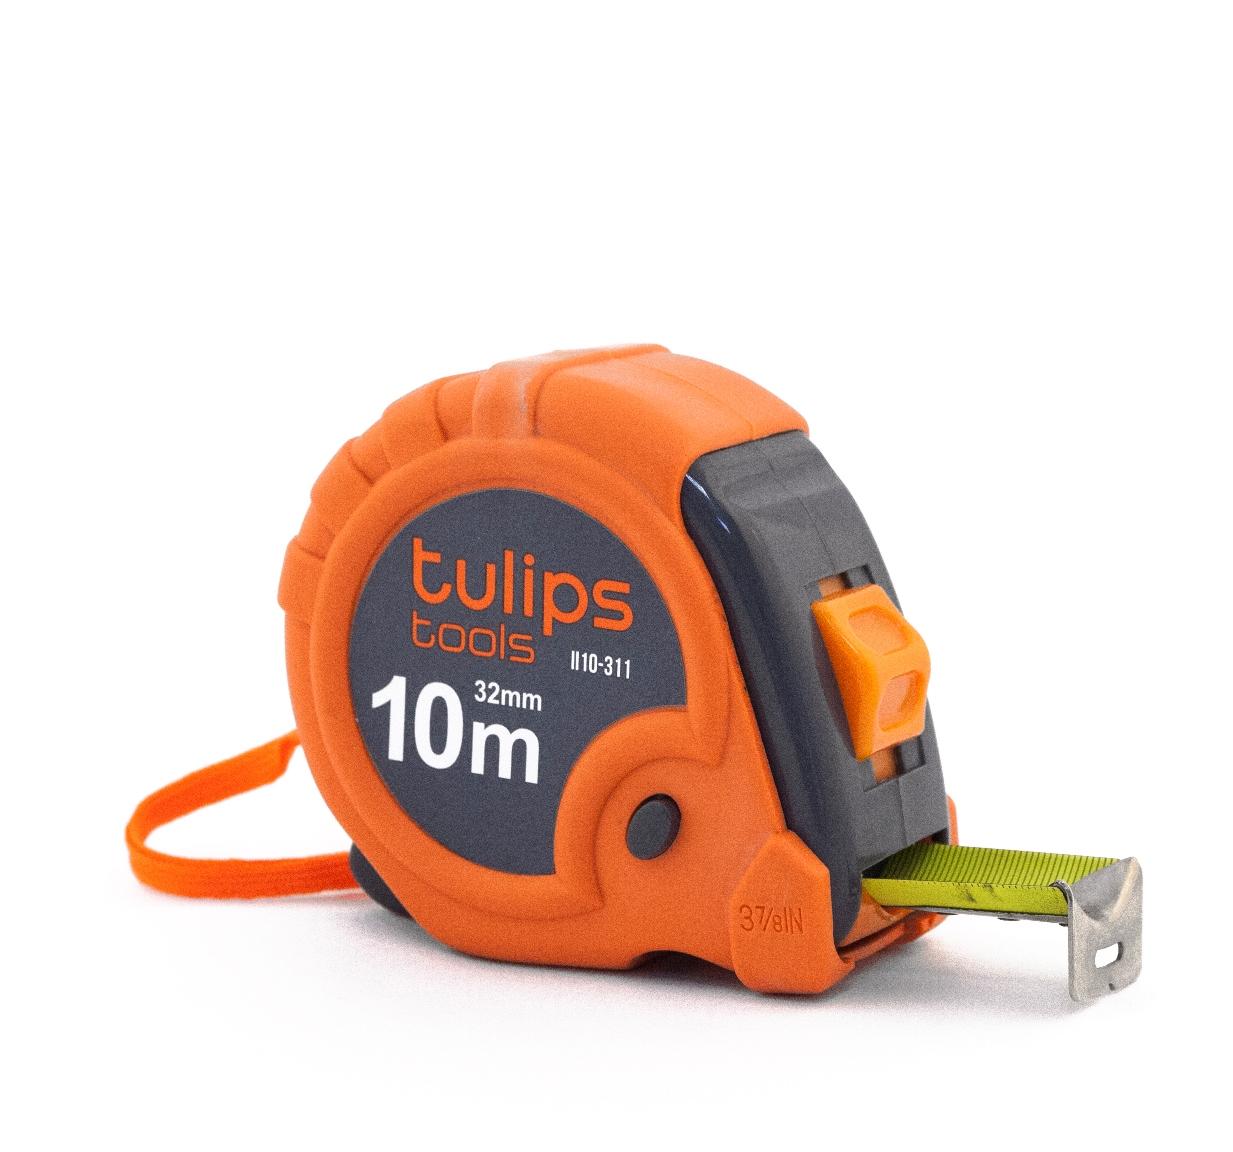 Рулетка Tulips toolsРулетки<br>Длина (м): 10,<br>Ширина: 32,<br>Тип рулетки: рулетка<br>